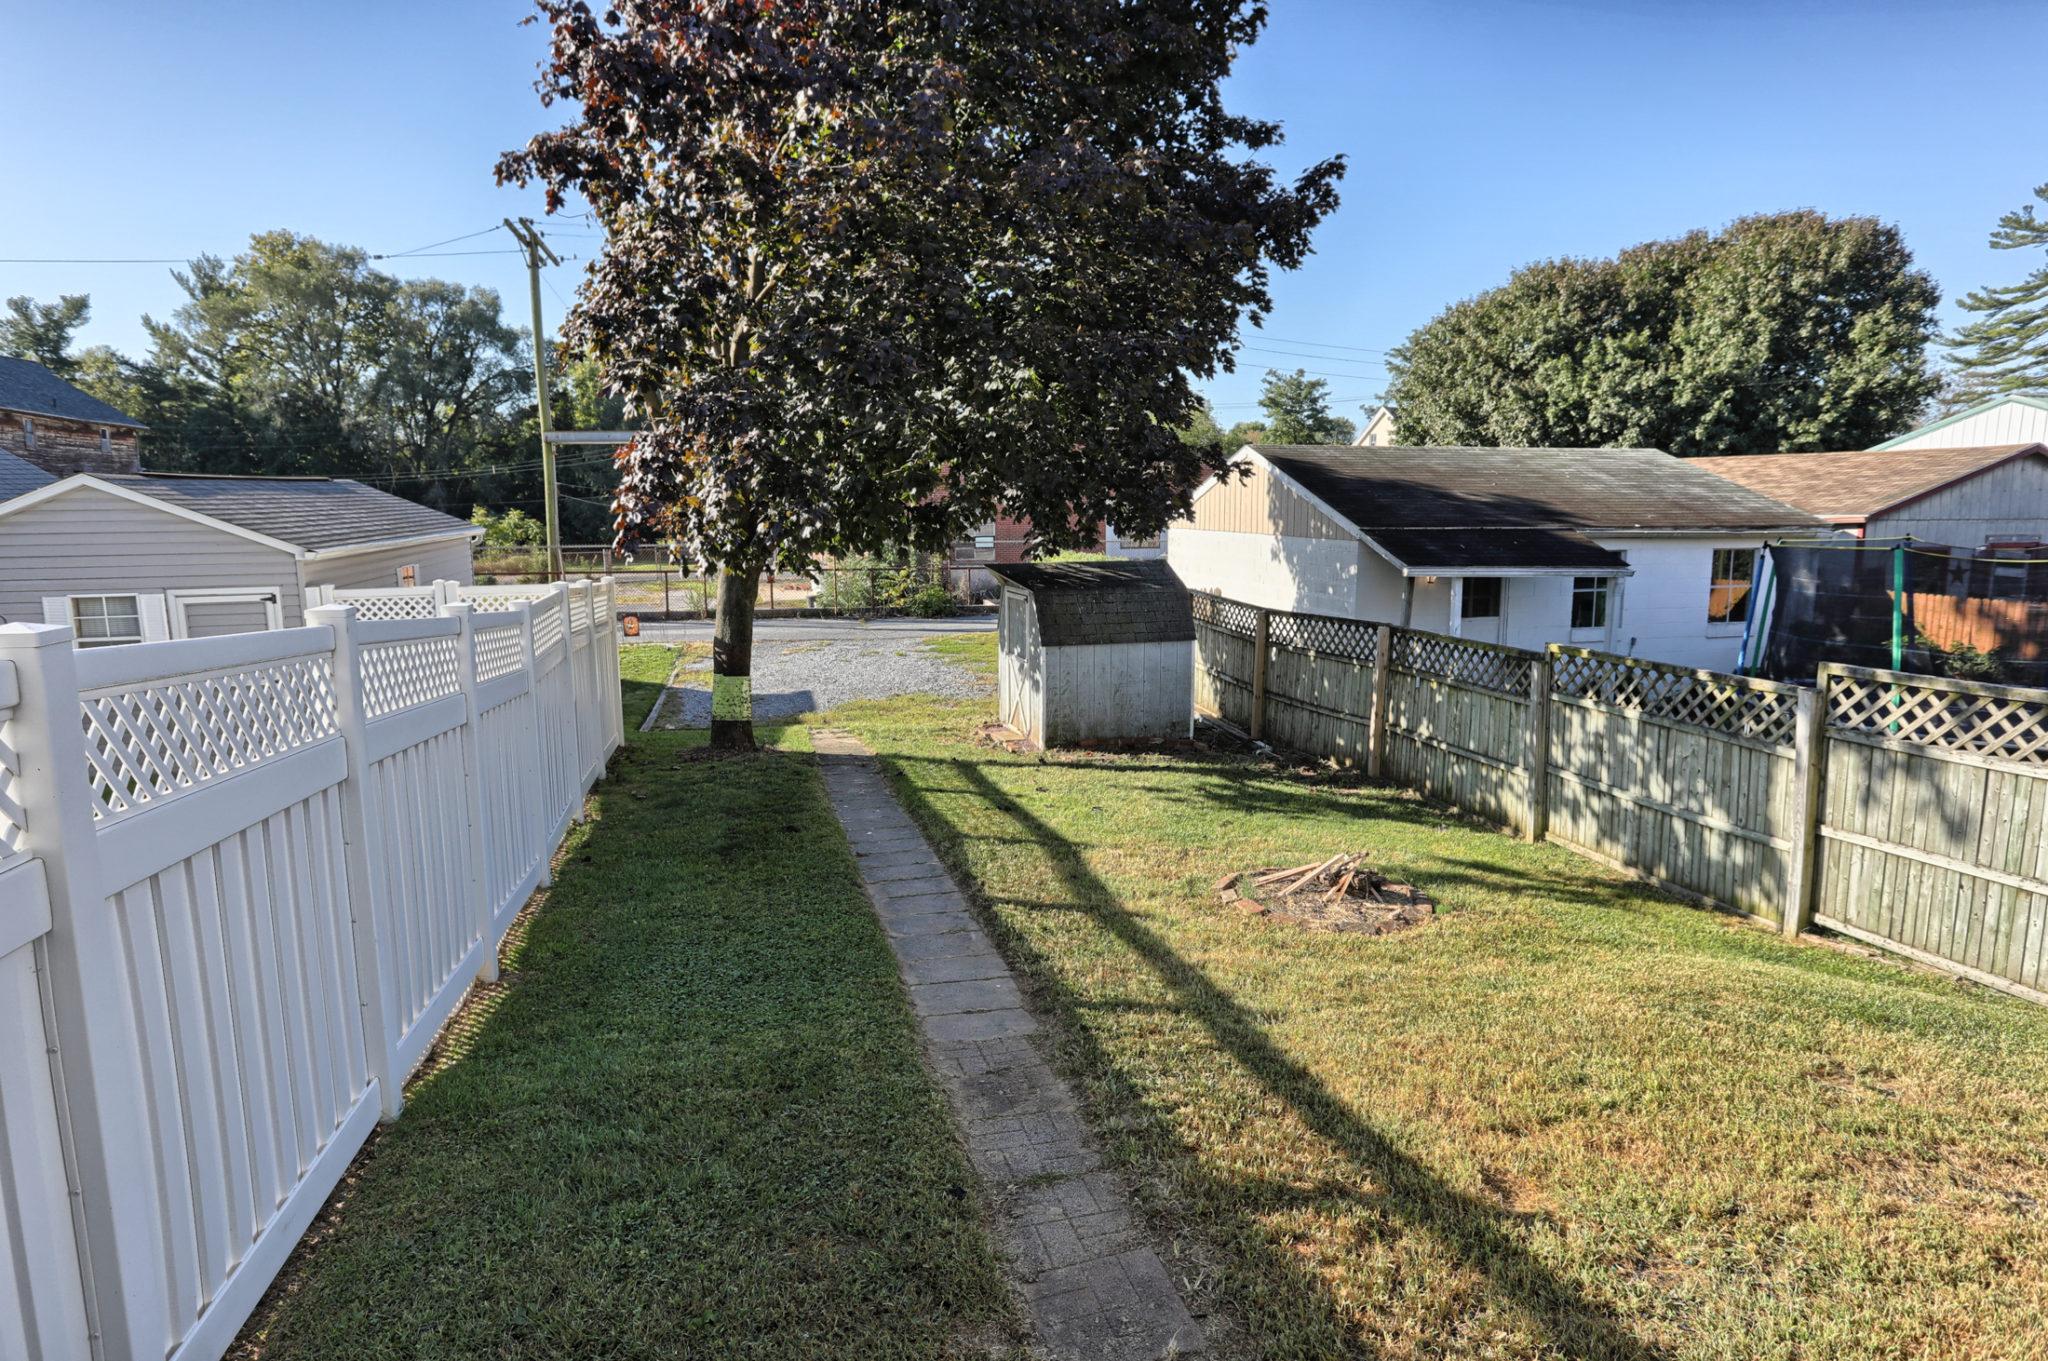 12 E. Maple Avenue - Backyard